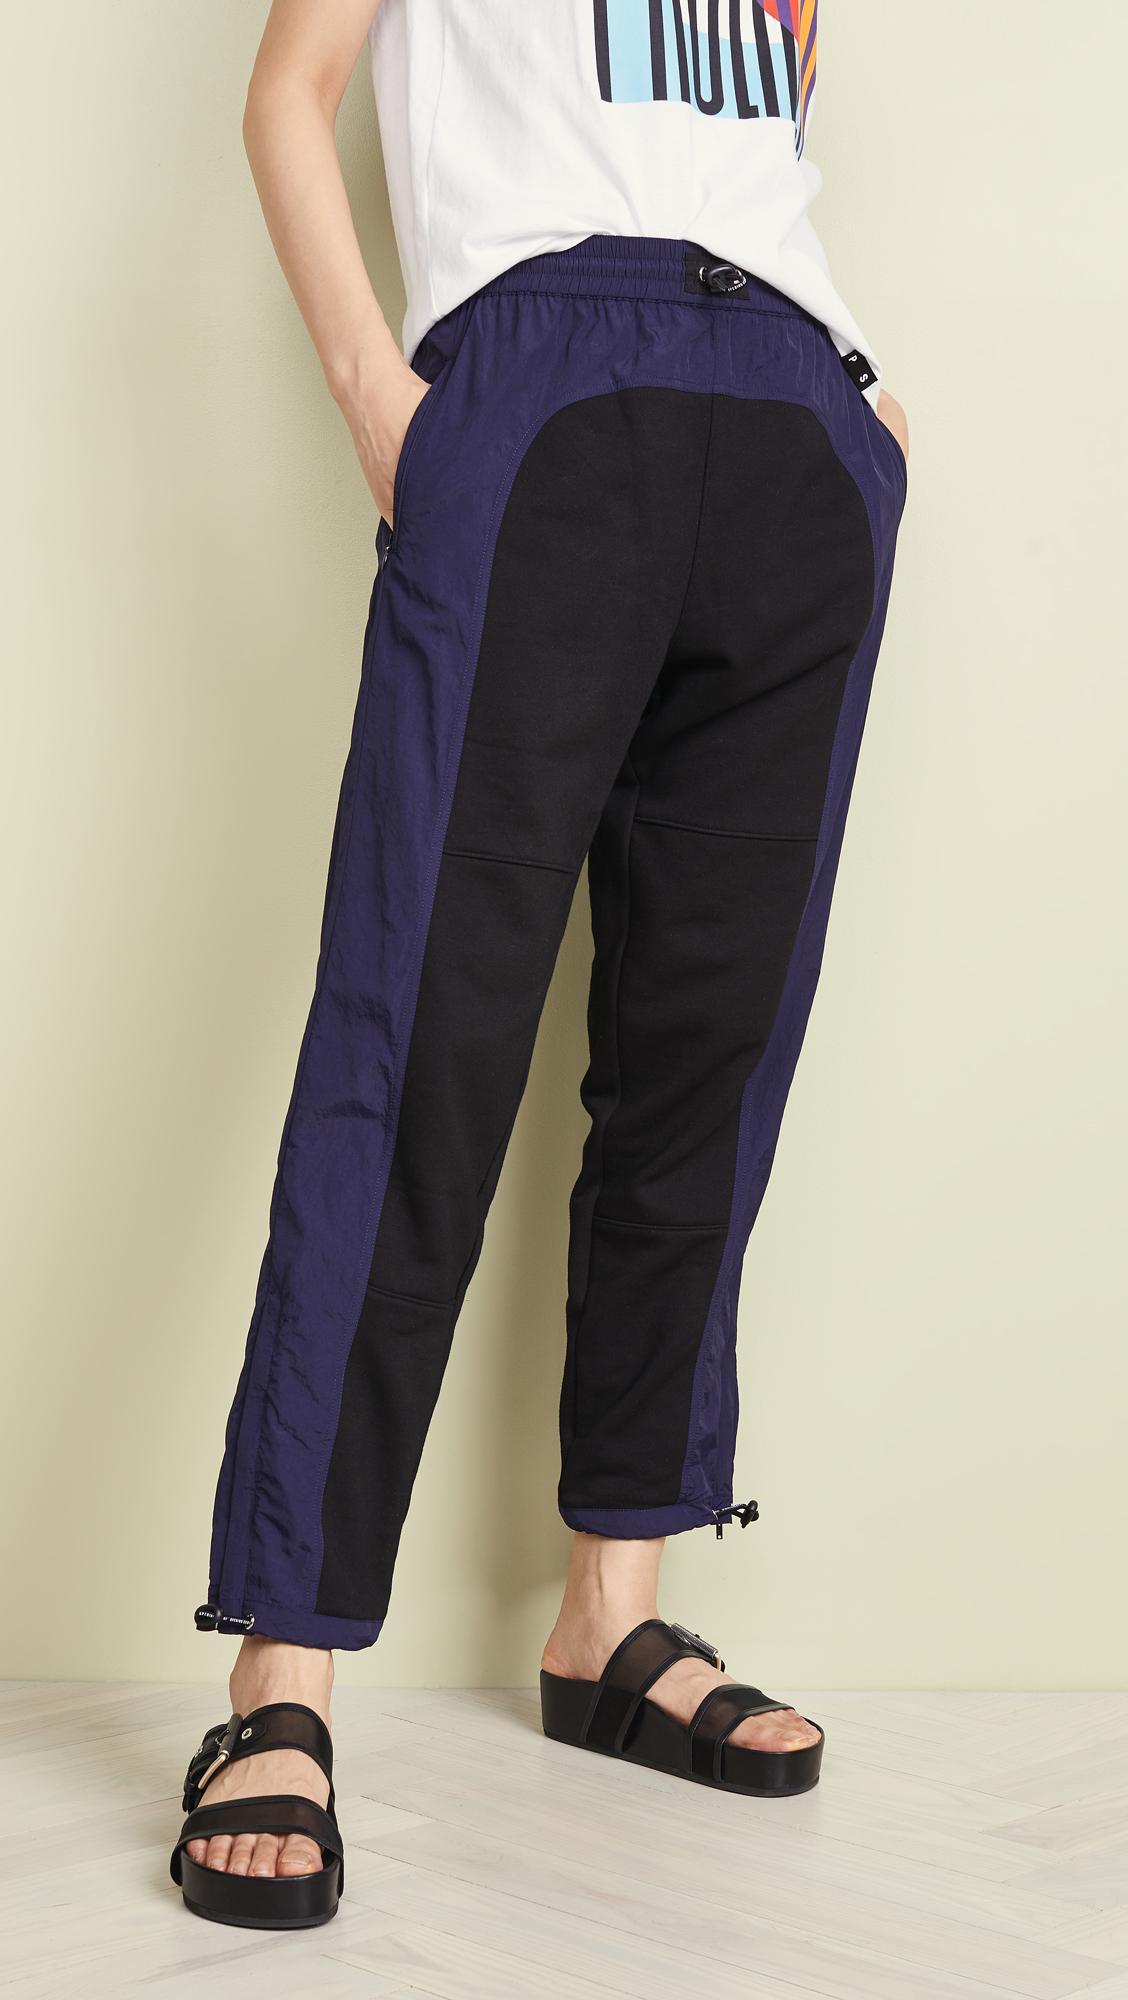 bfa1e8d32e18ab Opening Ceremony Nylon Hybrid Sweatpants in Blue - Lyst